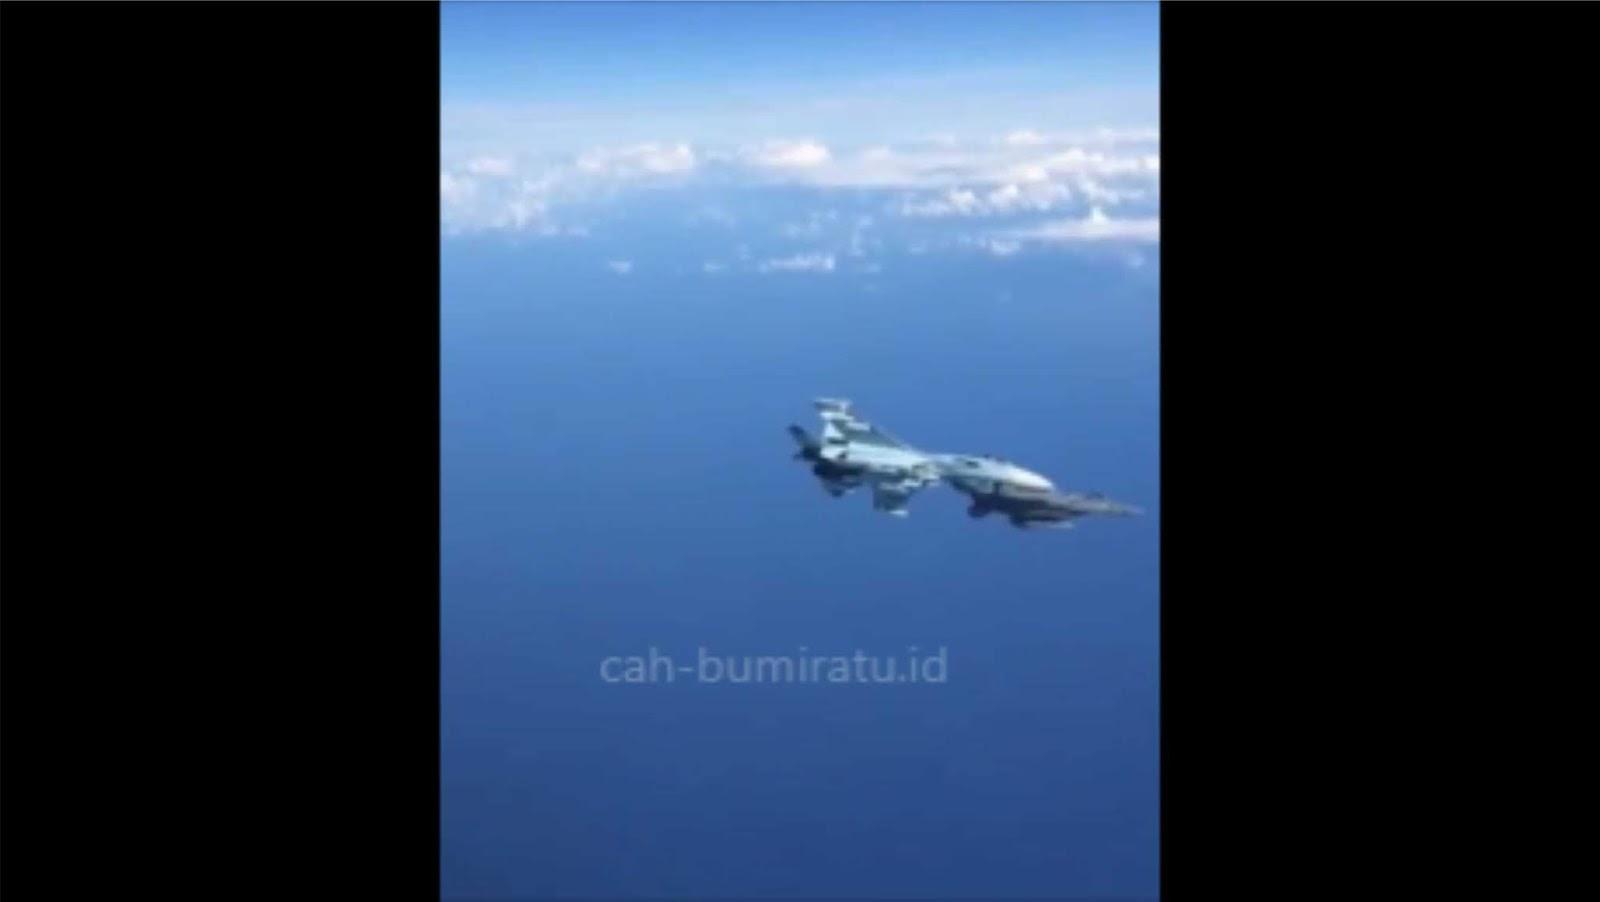 Video: Su-27 Rusia mengusir seorang pesawat tempur NATO dengan kasar